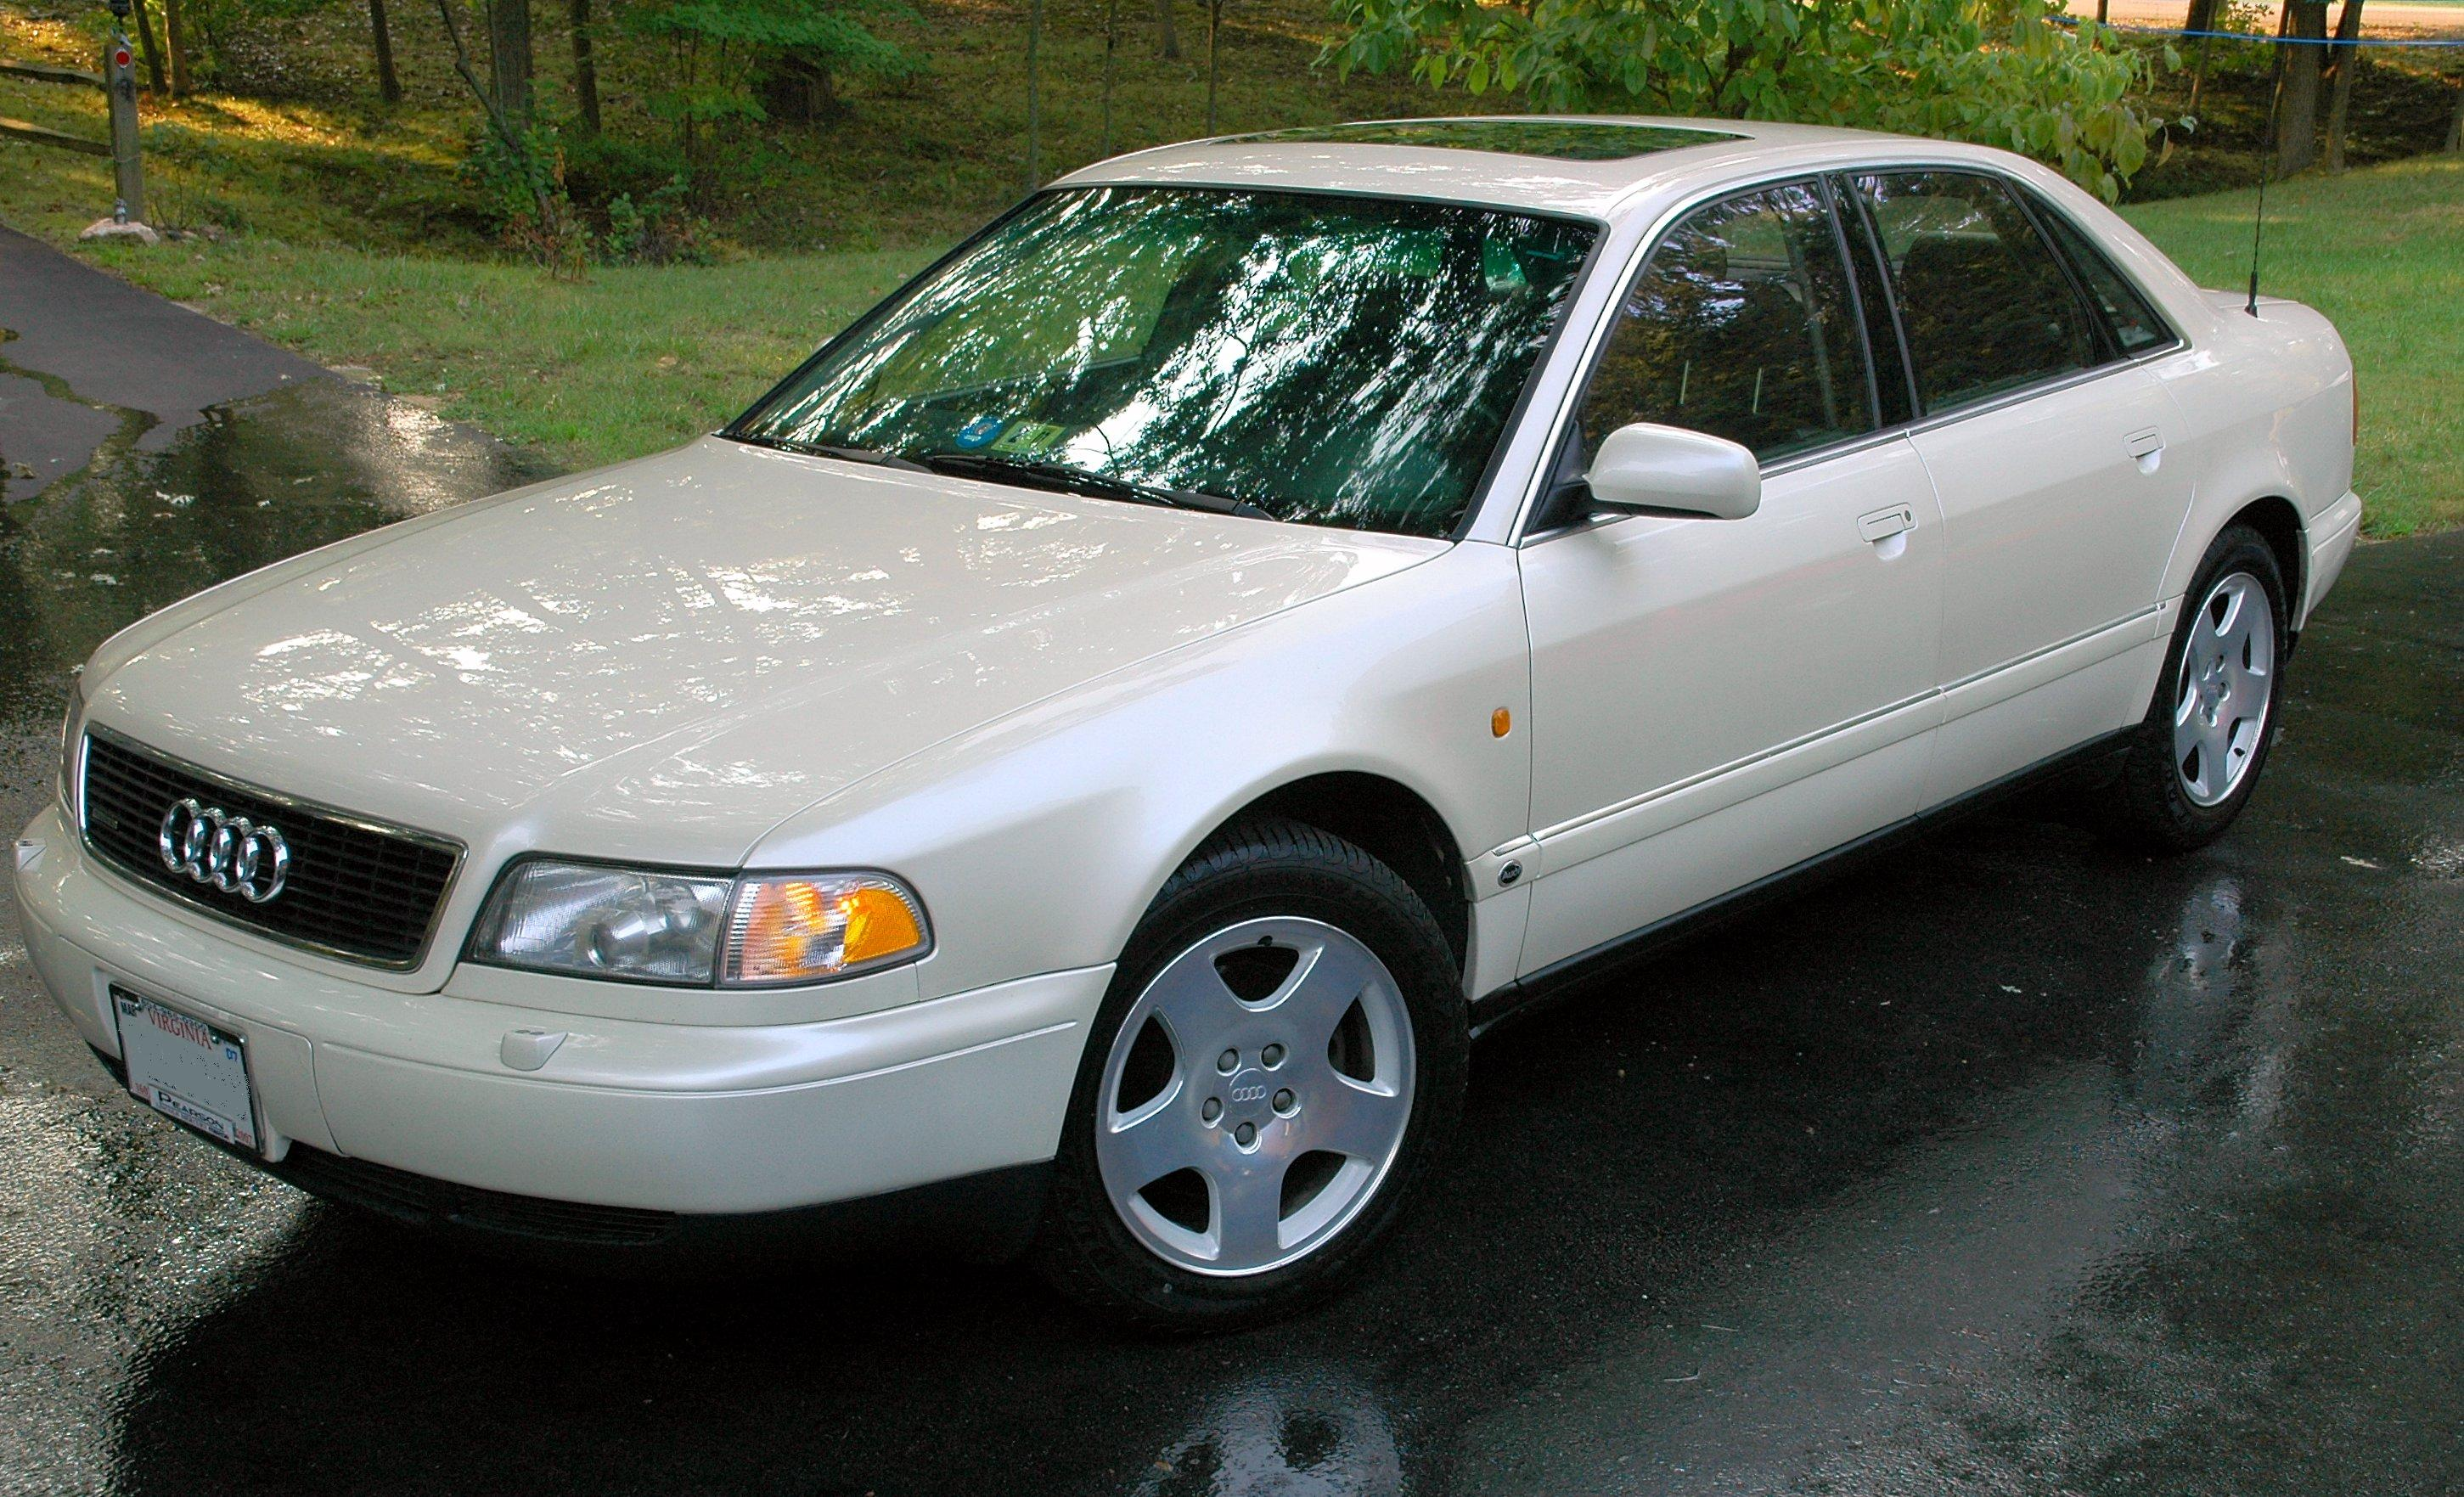 Audi A8 - Wikipedia, the free encyclopedia